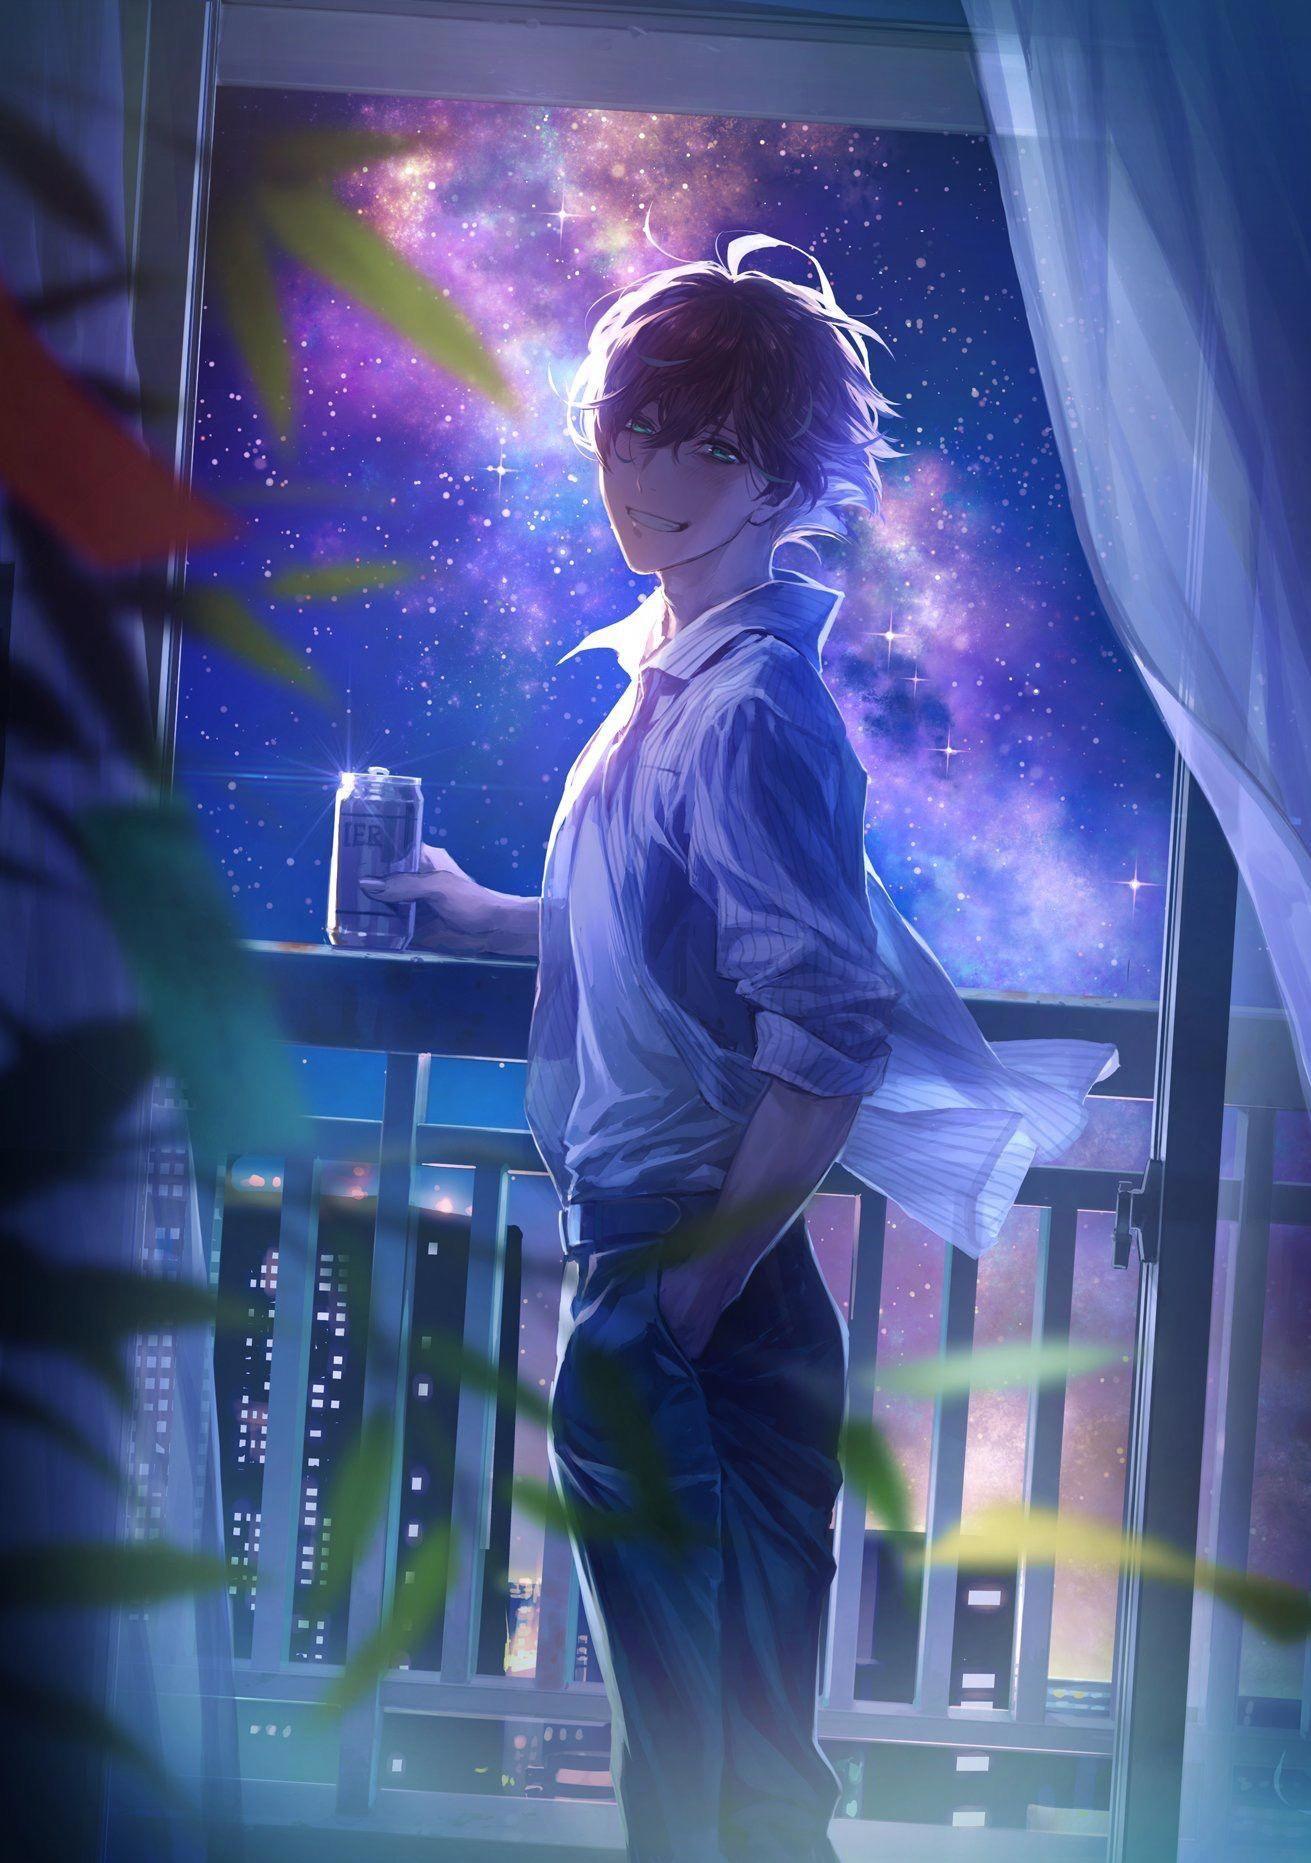 Sera Que Nosso Doppo Esta Finalmente Sorrindo Rap Battle Animeguys Handsome Anime Anime Drawings Boy Cute Anime Guys